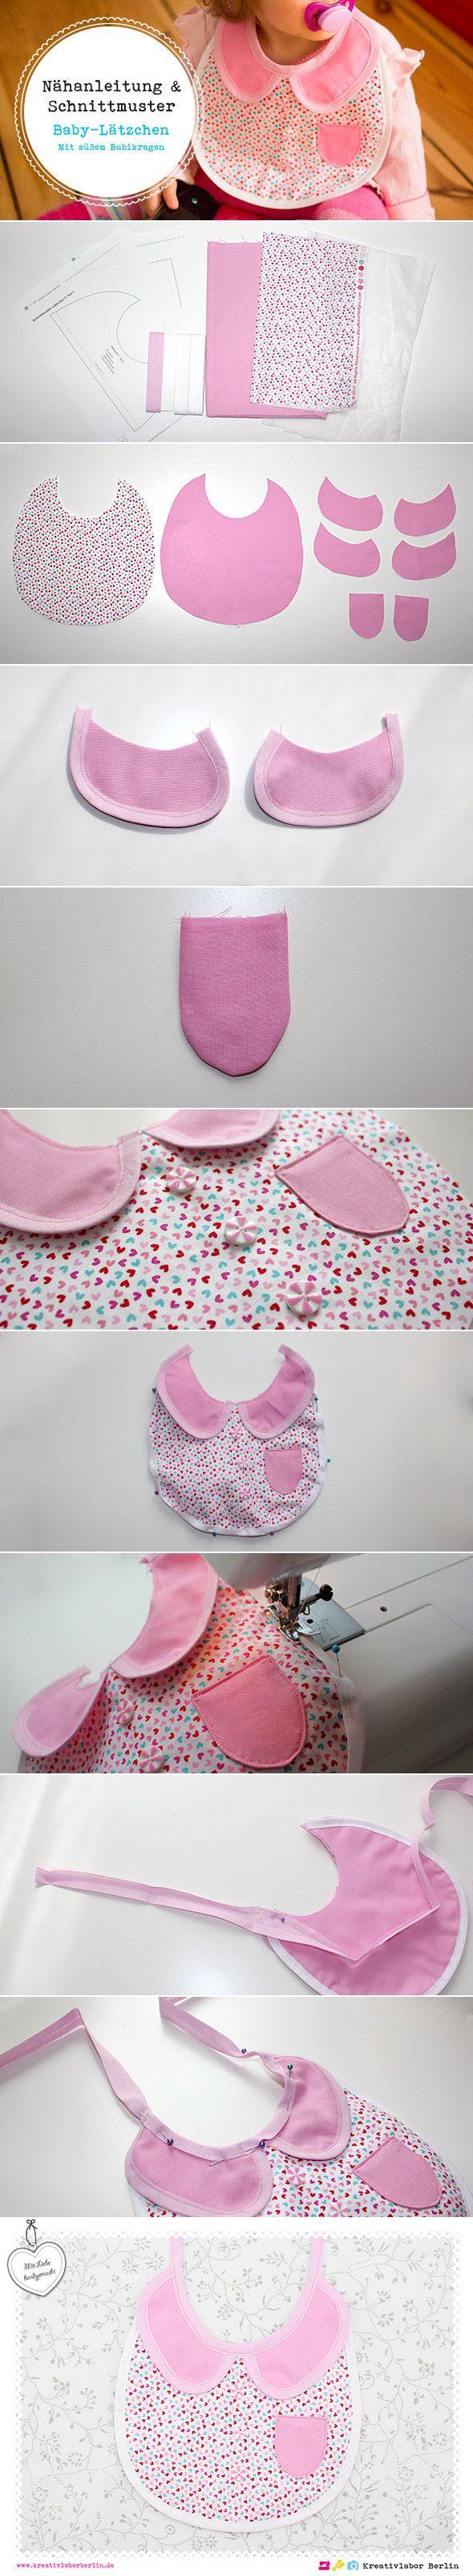 Die komplette Nähanleitung inkl. Schnittmuster gibt es in meinem Blog: http://www.kreativlaborberlin.de/suesse-baby-laetzchen-in-3-varianten